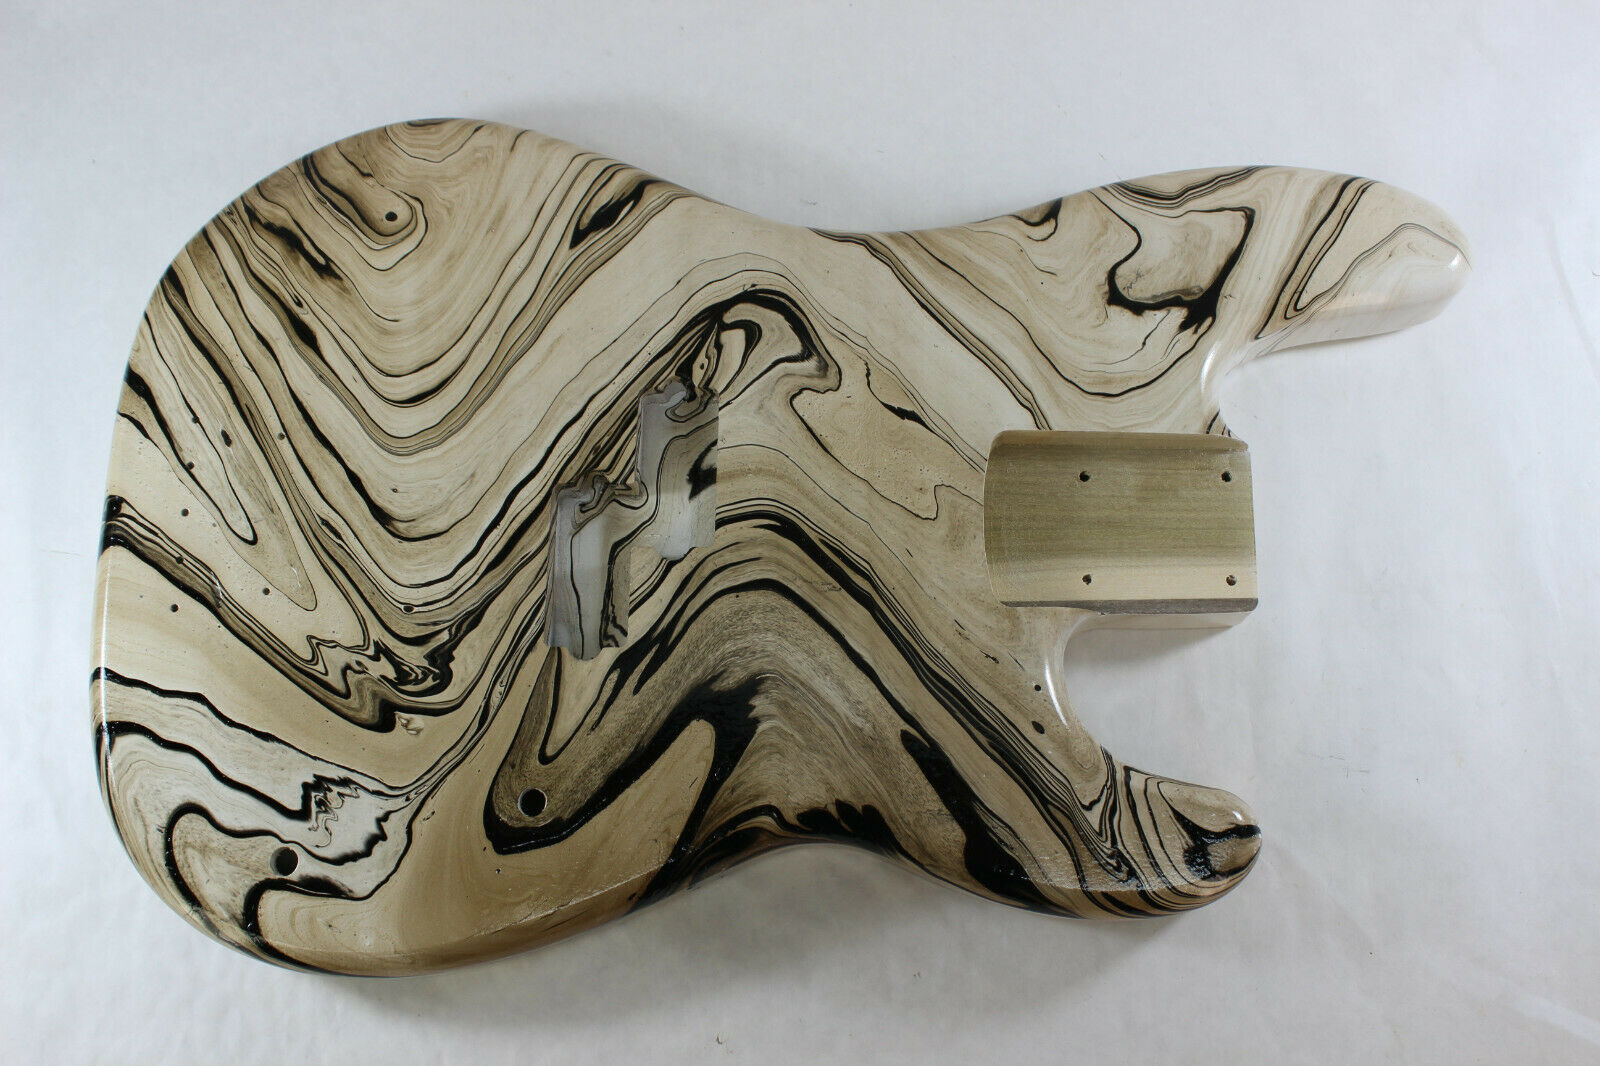 MultiFarbe swirl painted poplar P bass guitar body - fits fender necks J111